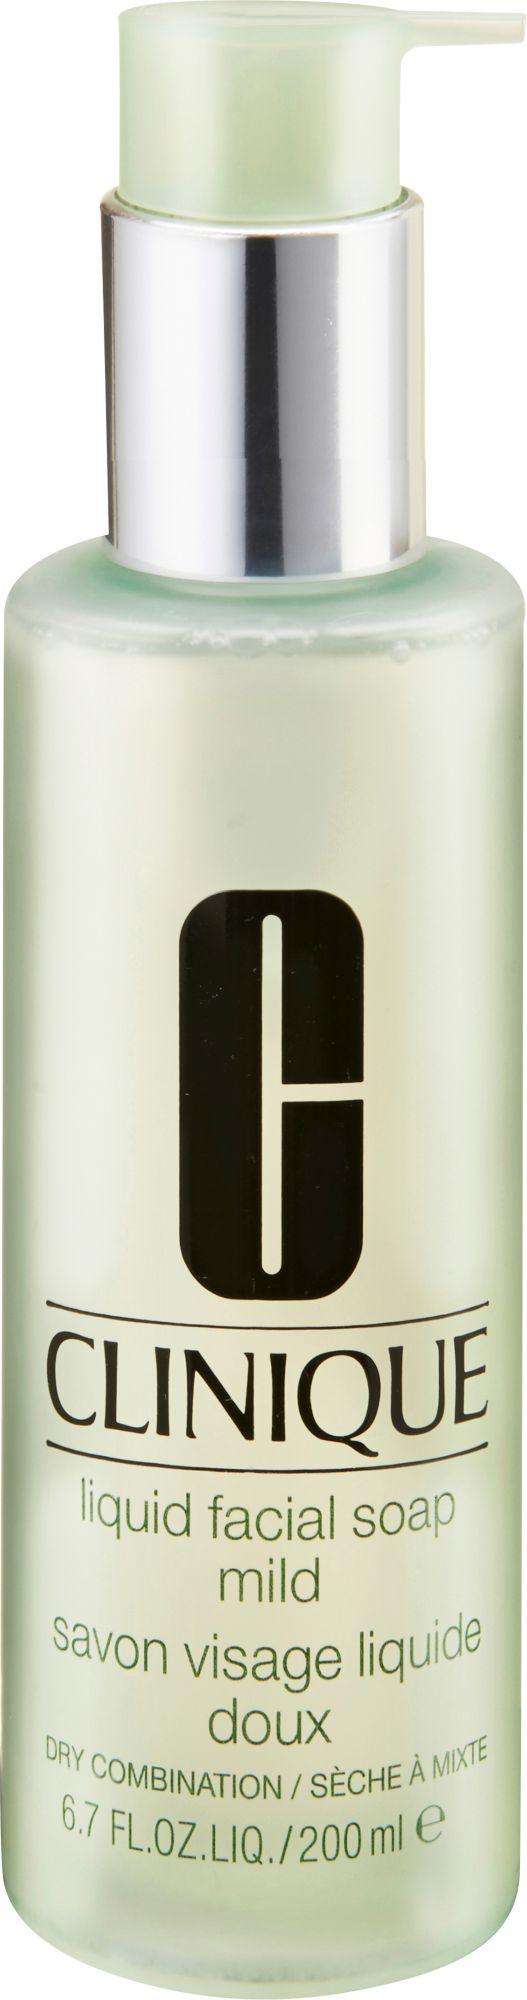 CLINIQUE Clinique, »Liquid Facial Soap - mild«, Flüssige Gesichtsseife